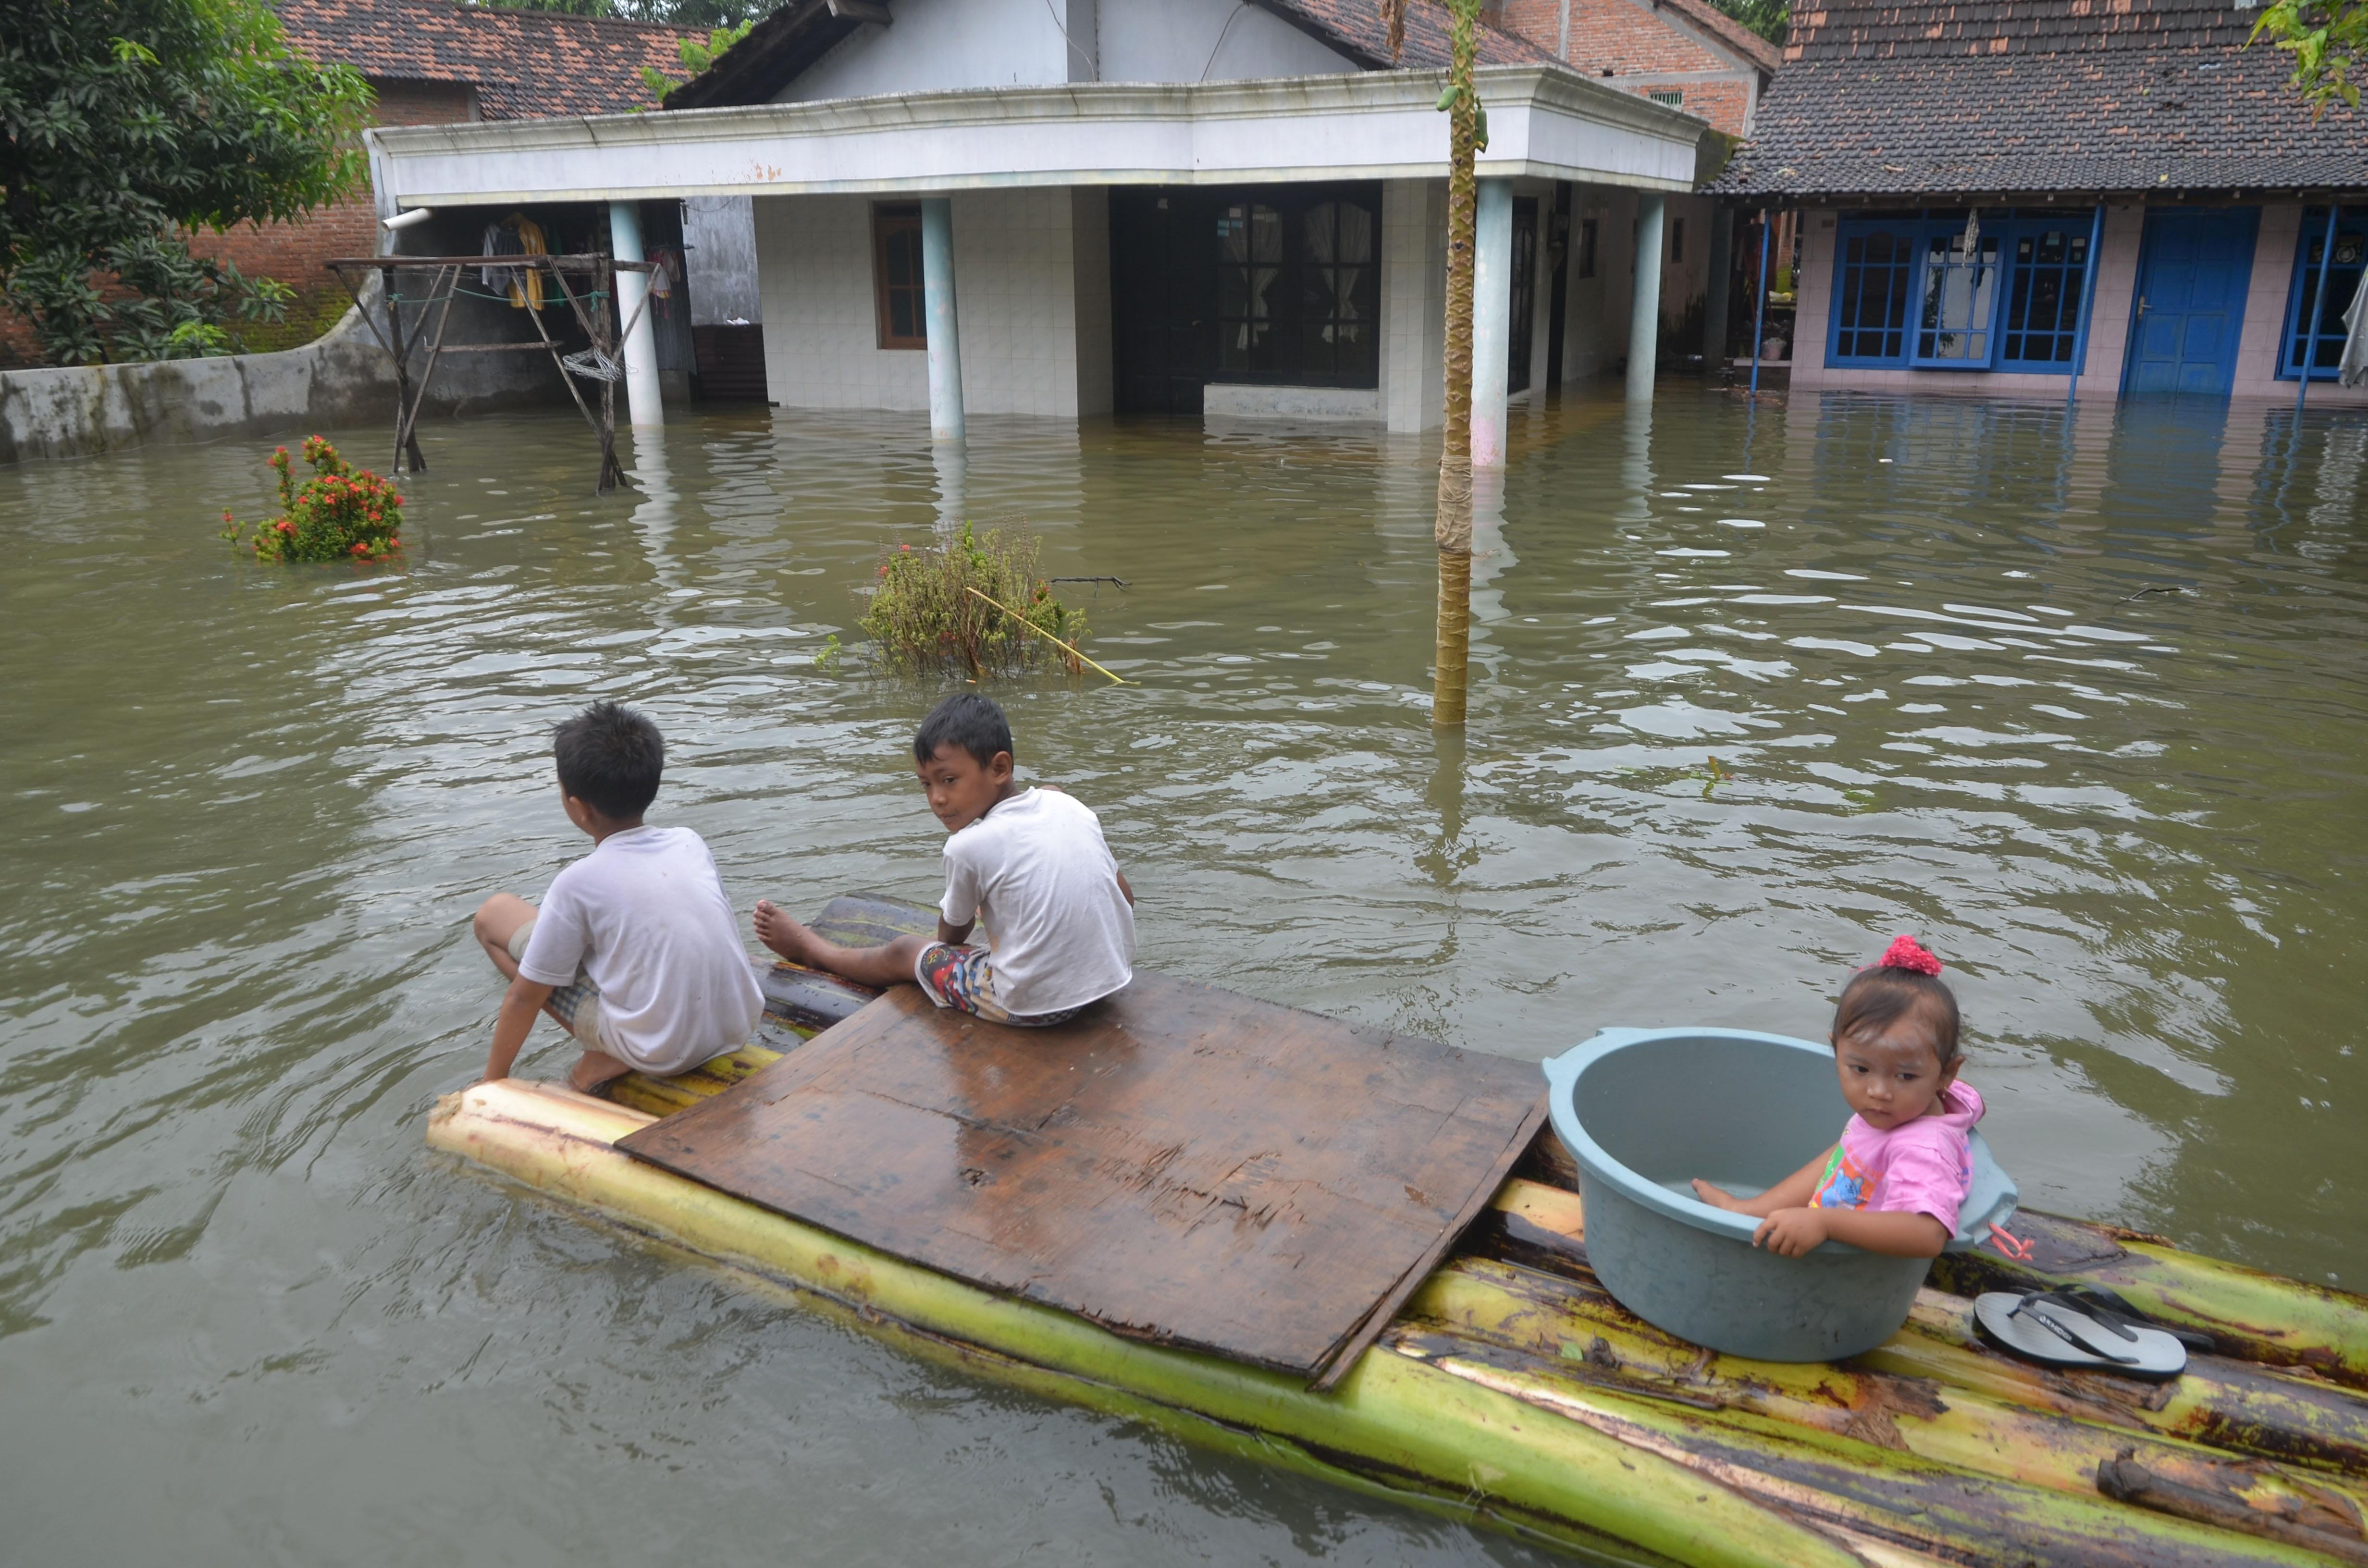 Anak-anak dengan menggunakan rakit batang pisang melewati jalan yang tergenang banjir di Desa Jati Wetan, Kudus, Jawa Tengah, pada 9 Februari 2017. Foto oleh Yusuf Nugroho/Antara